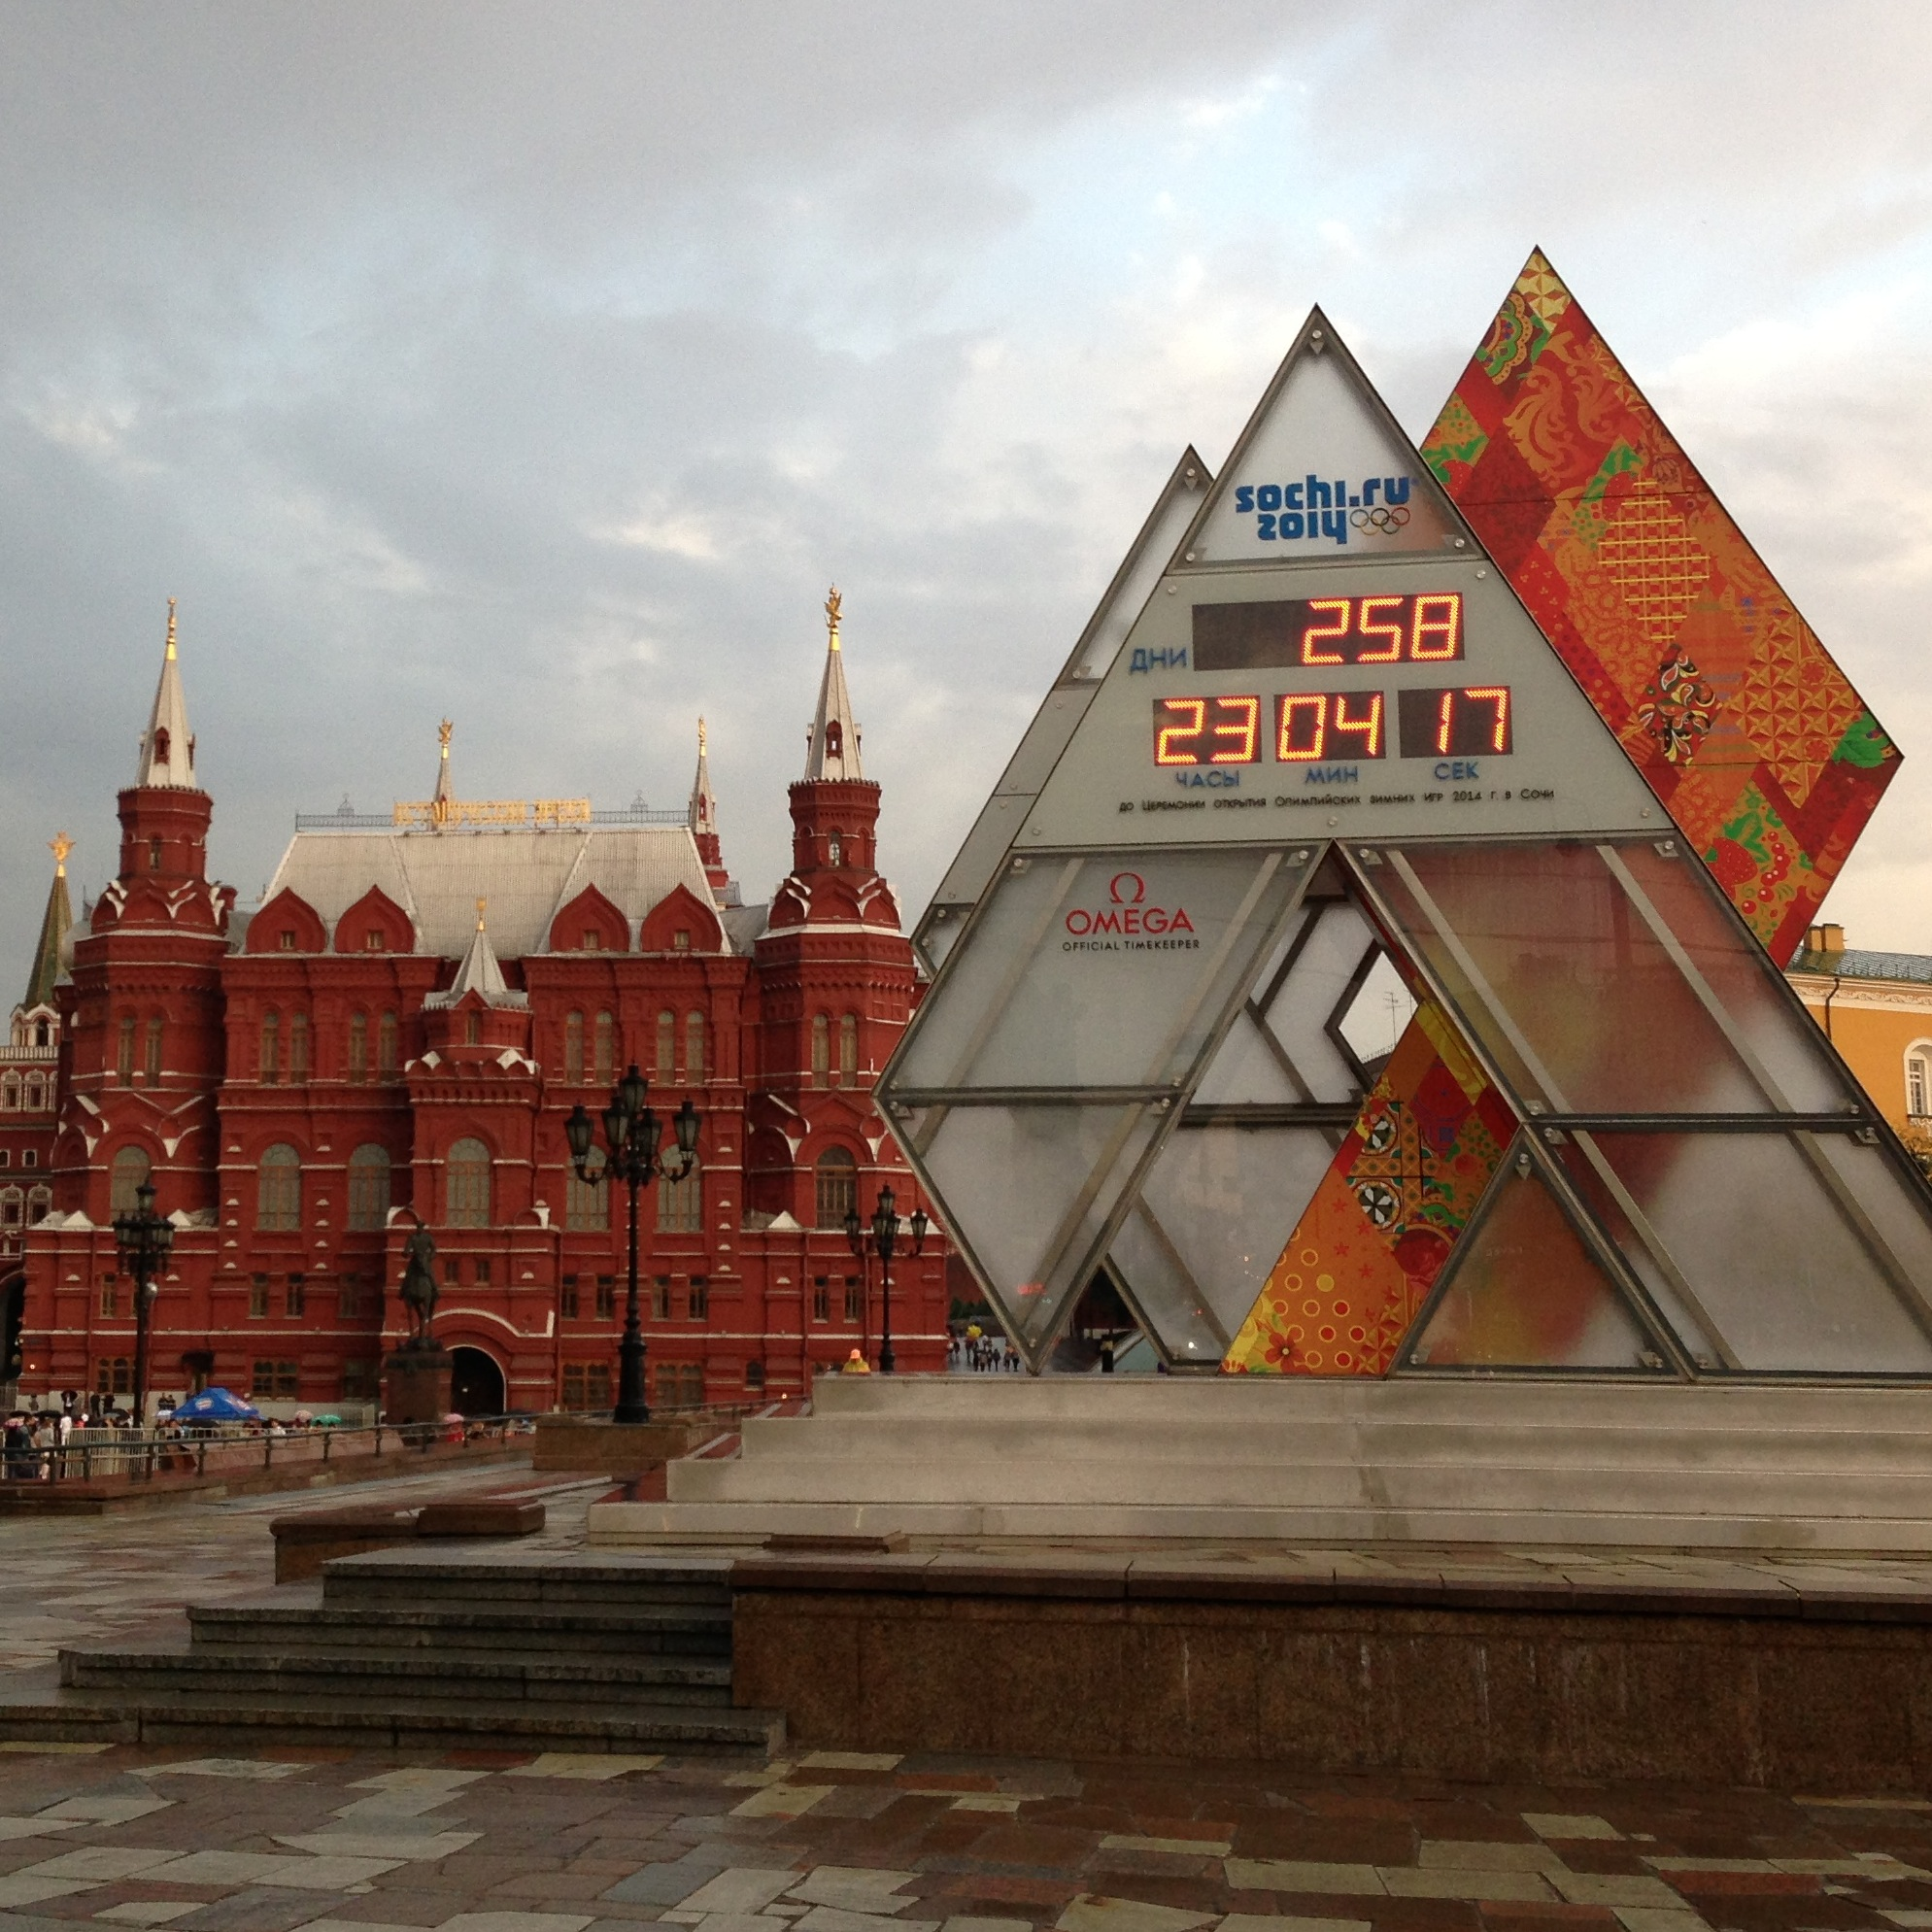 Sochi 2014 - Countdown